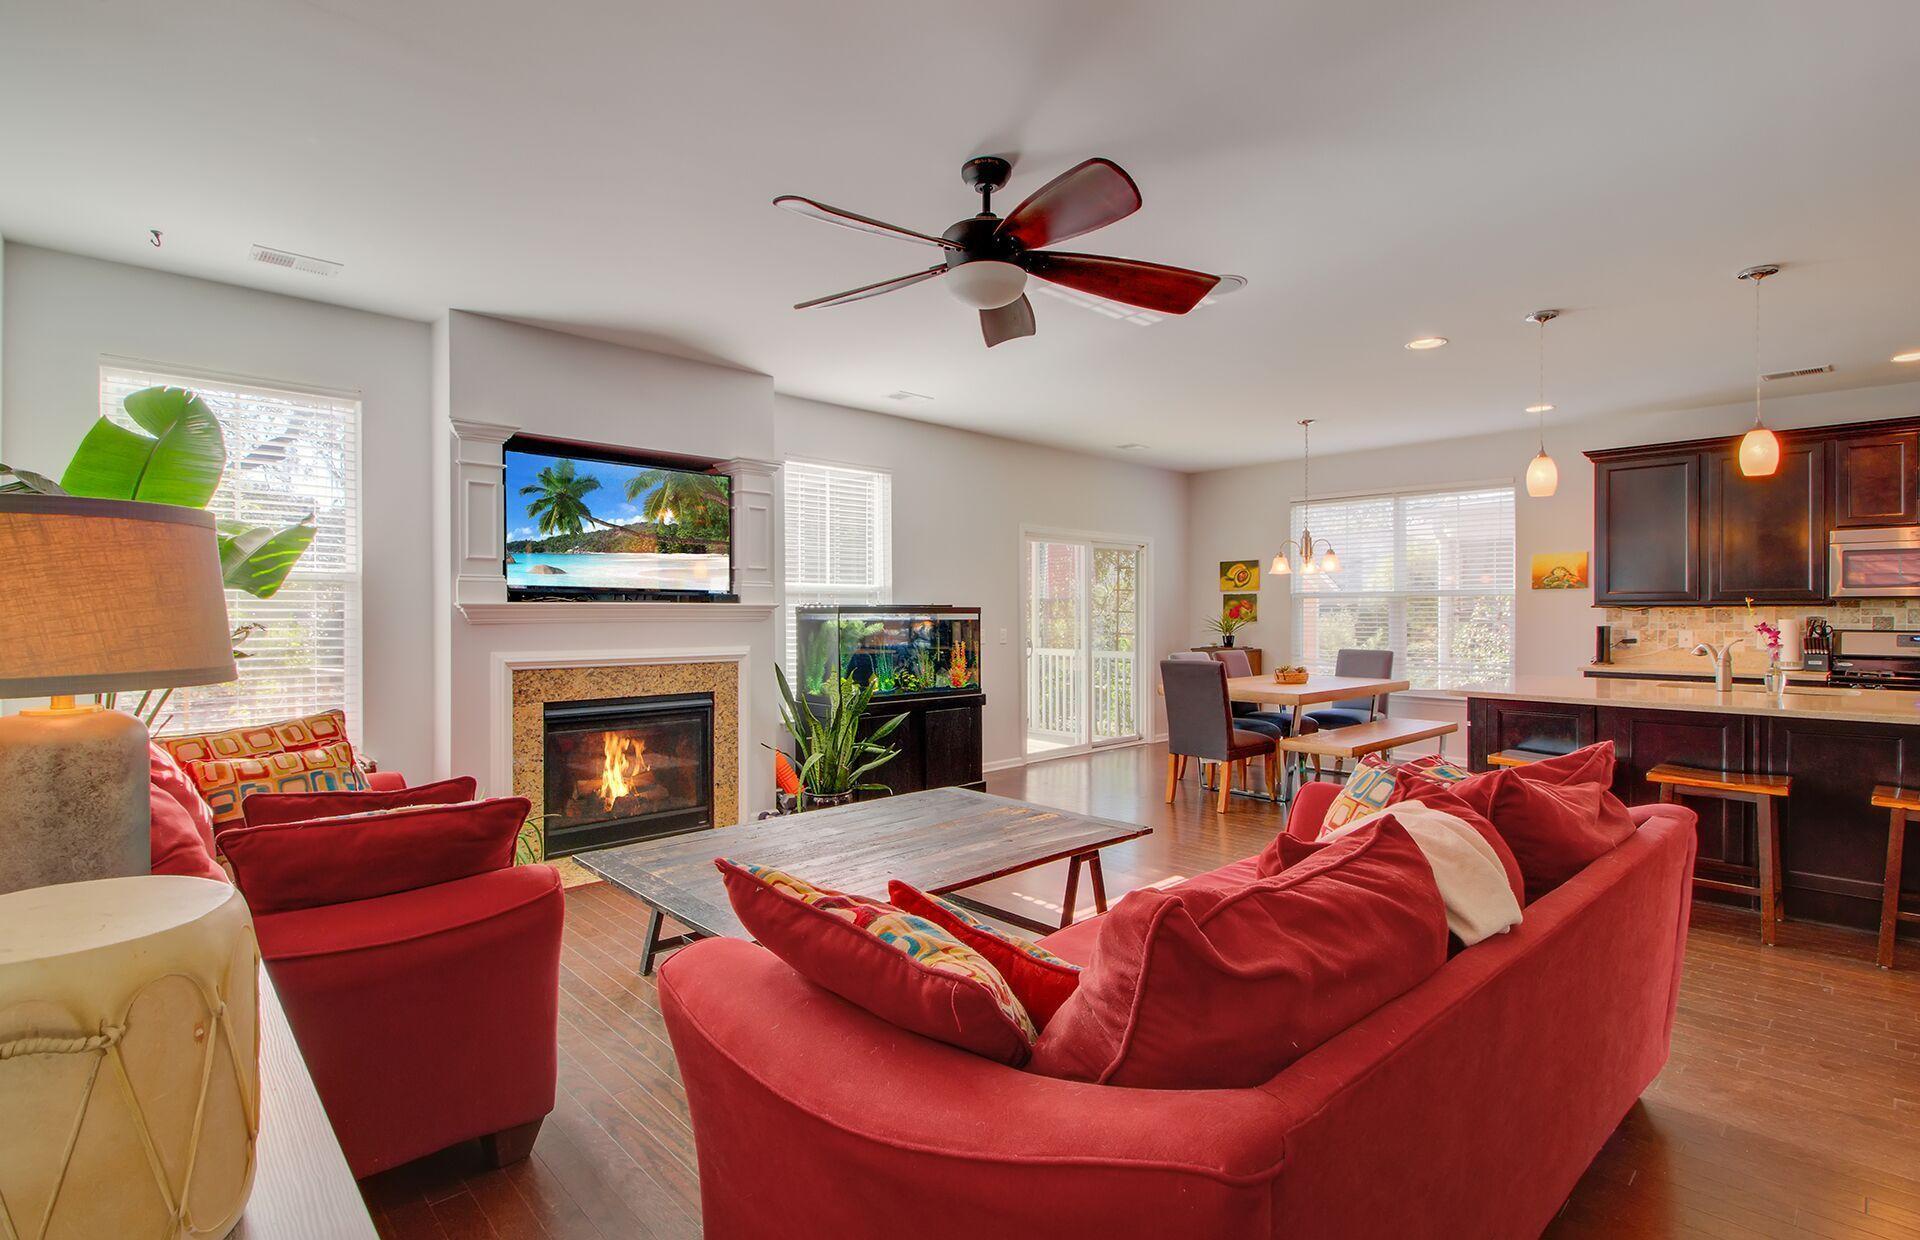 Oak Terrace Preserve Homes For Sale - 4967 Liberty Park, North Charleston, SC - 33